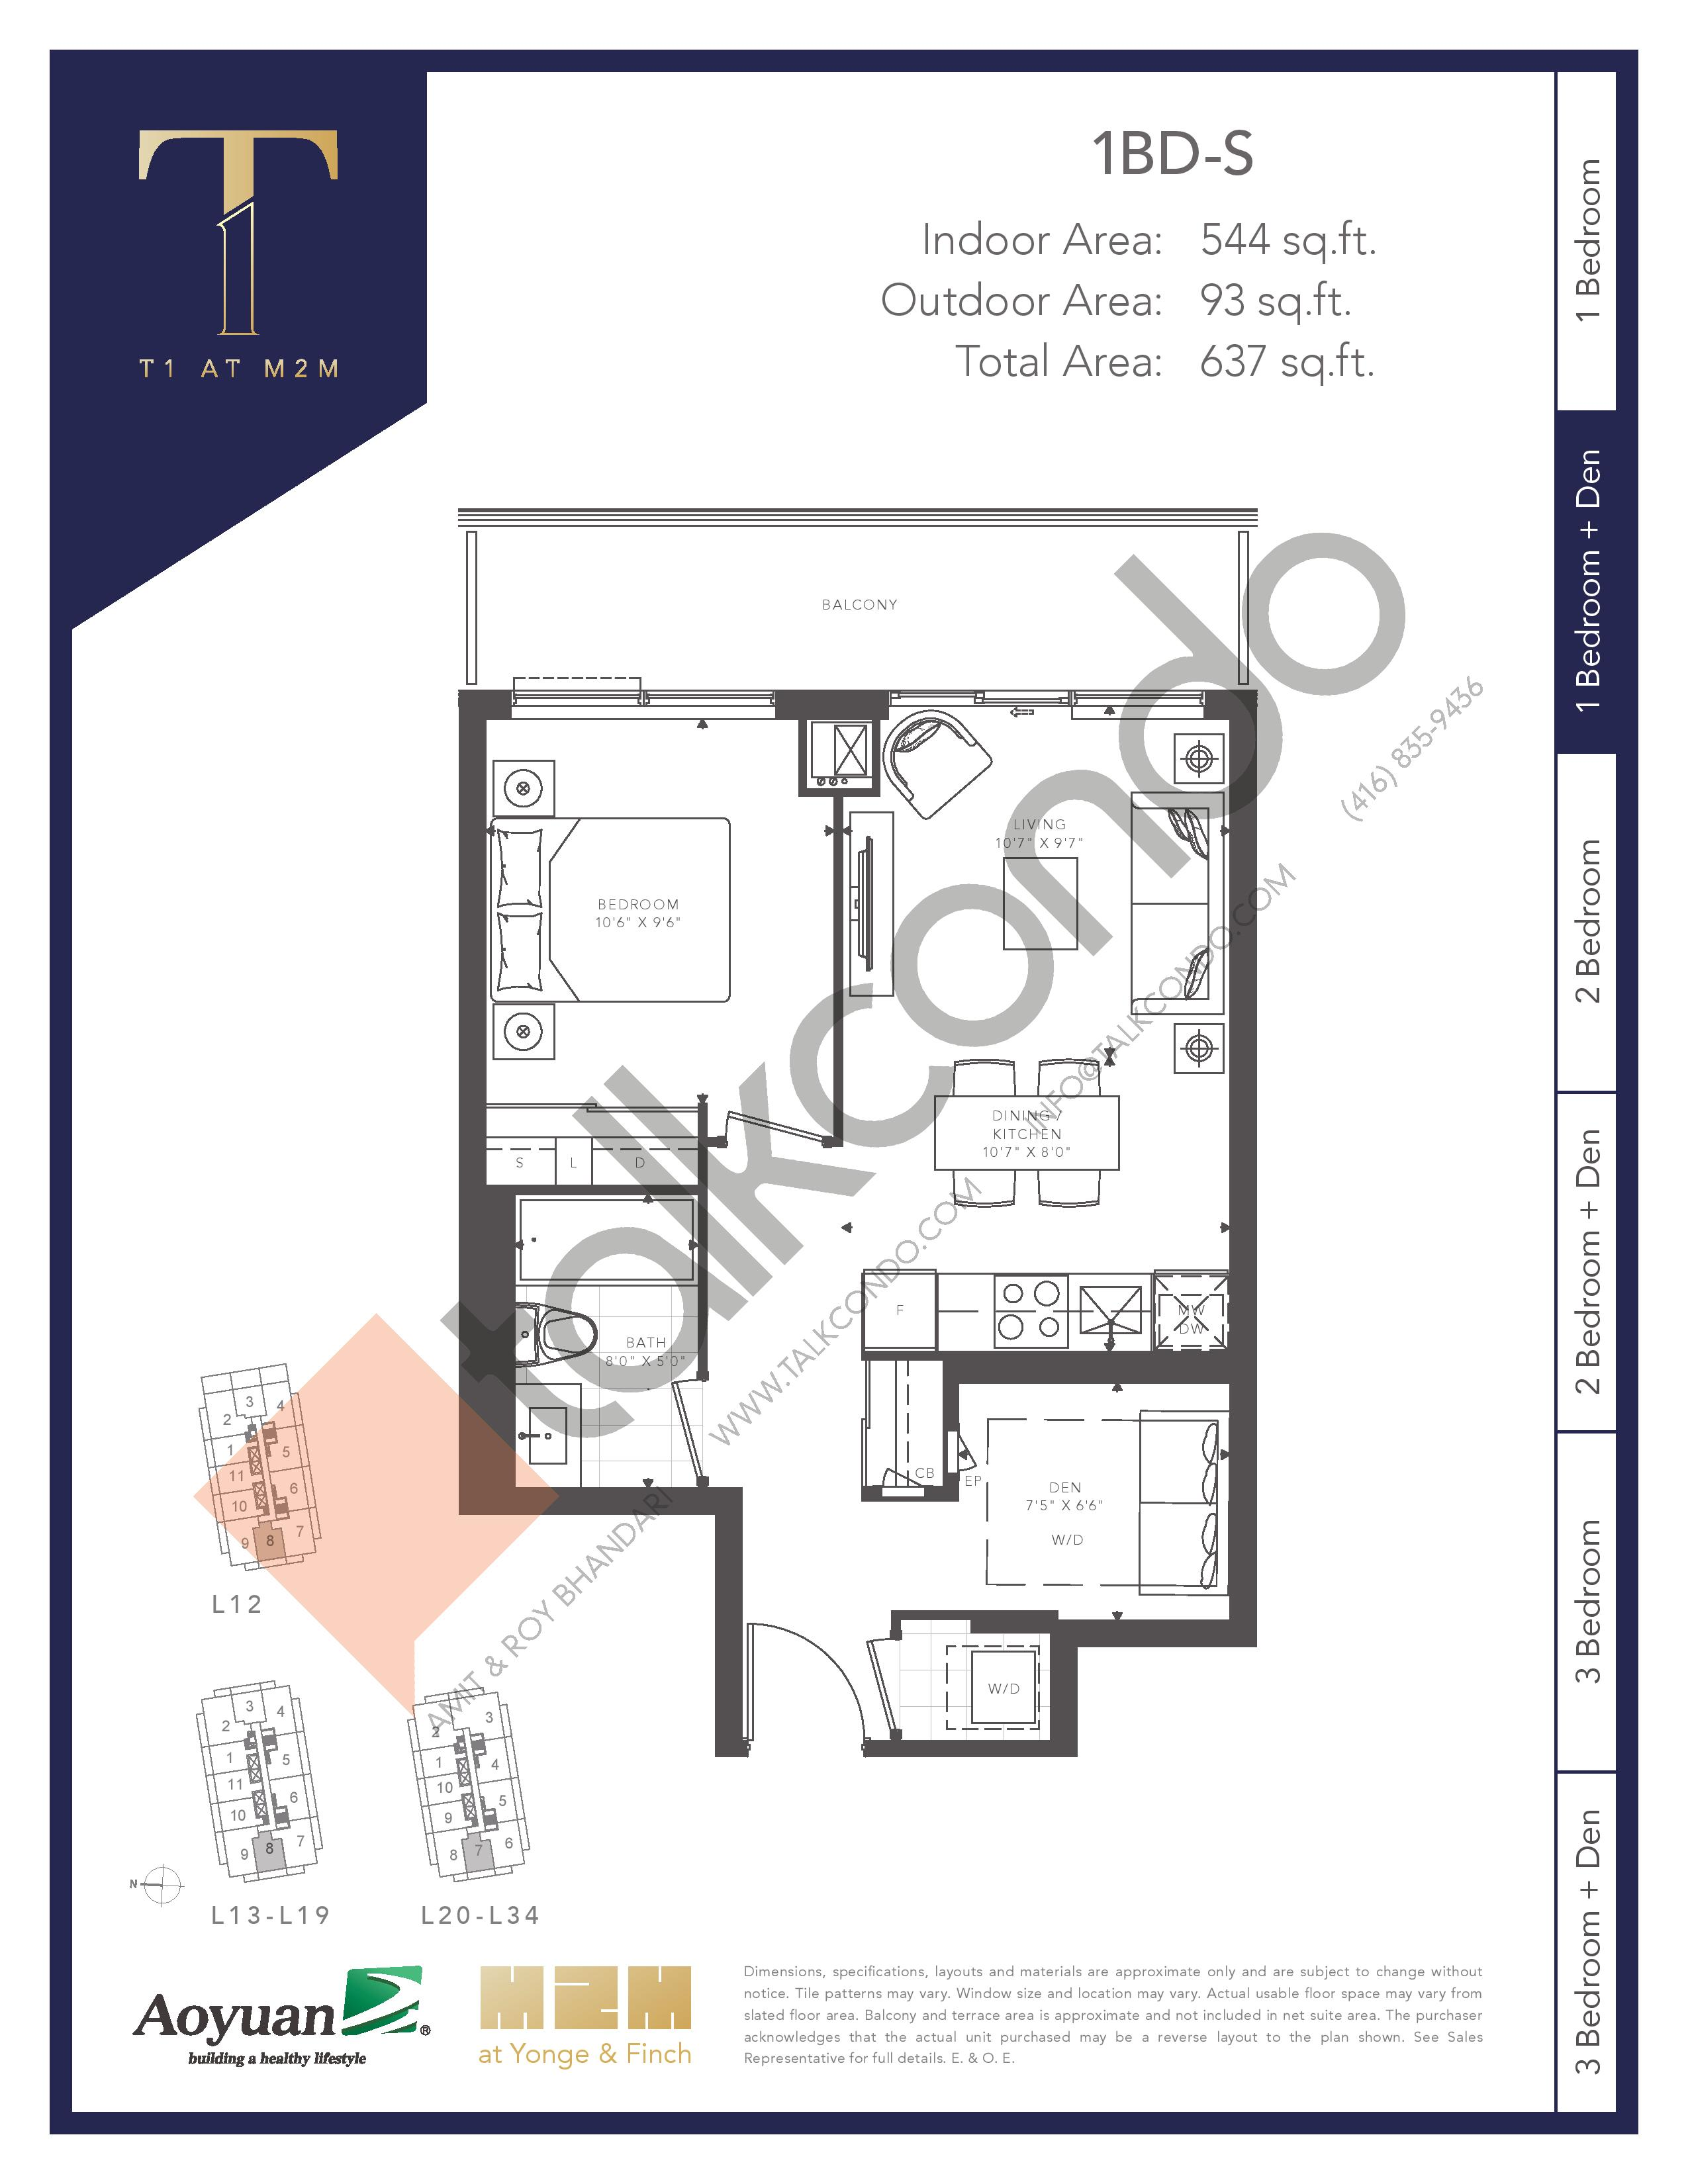 1BD-S (Tower) Floor Plan at T1 at M2M Condos - 544 sq.ft